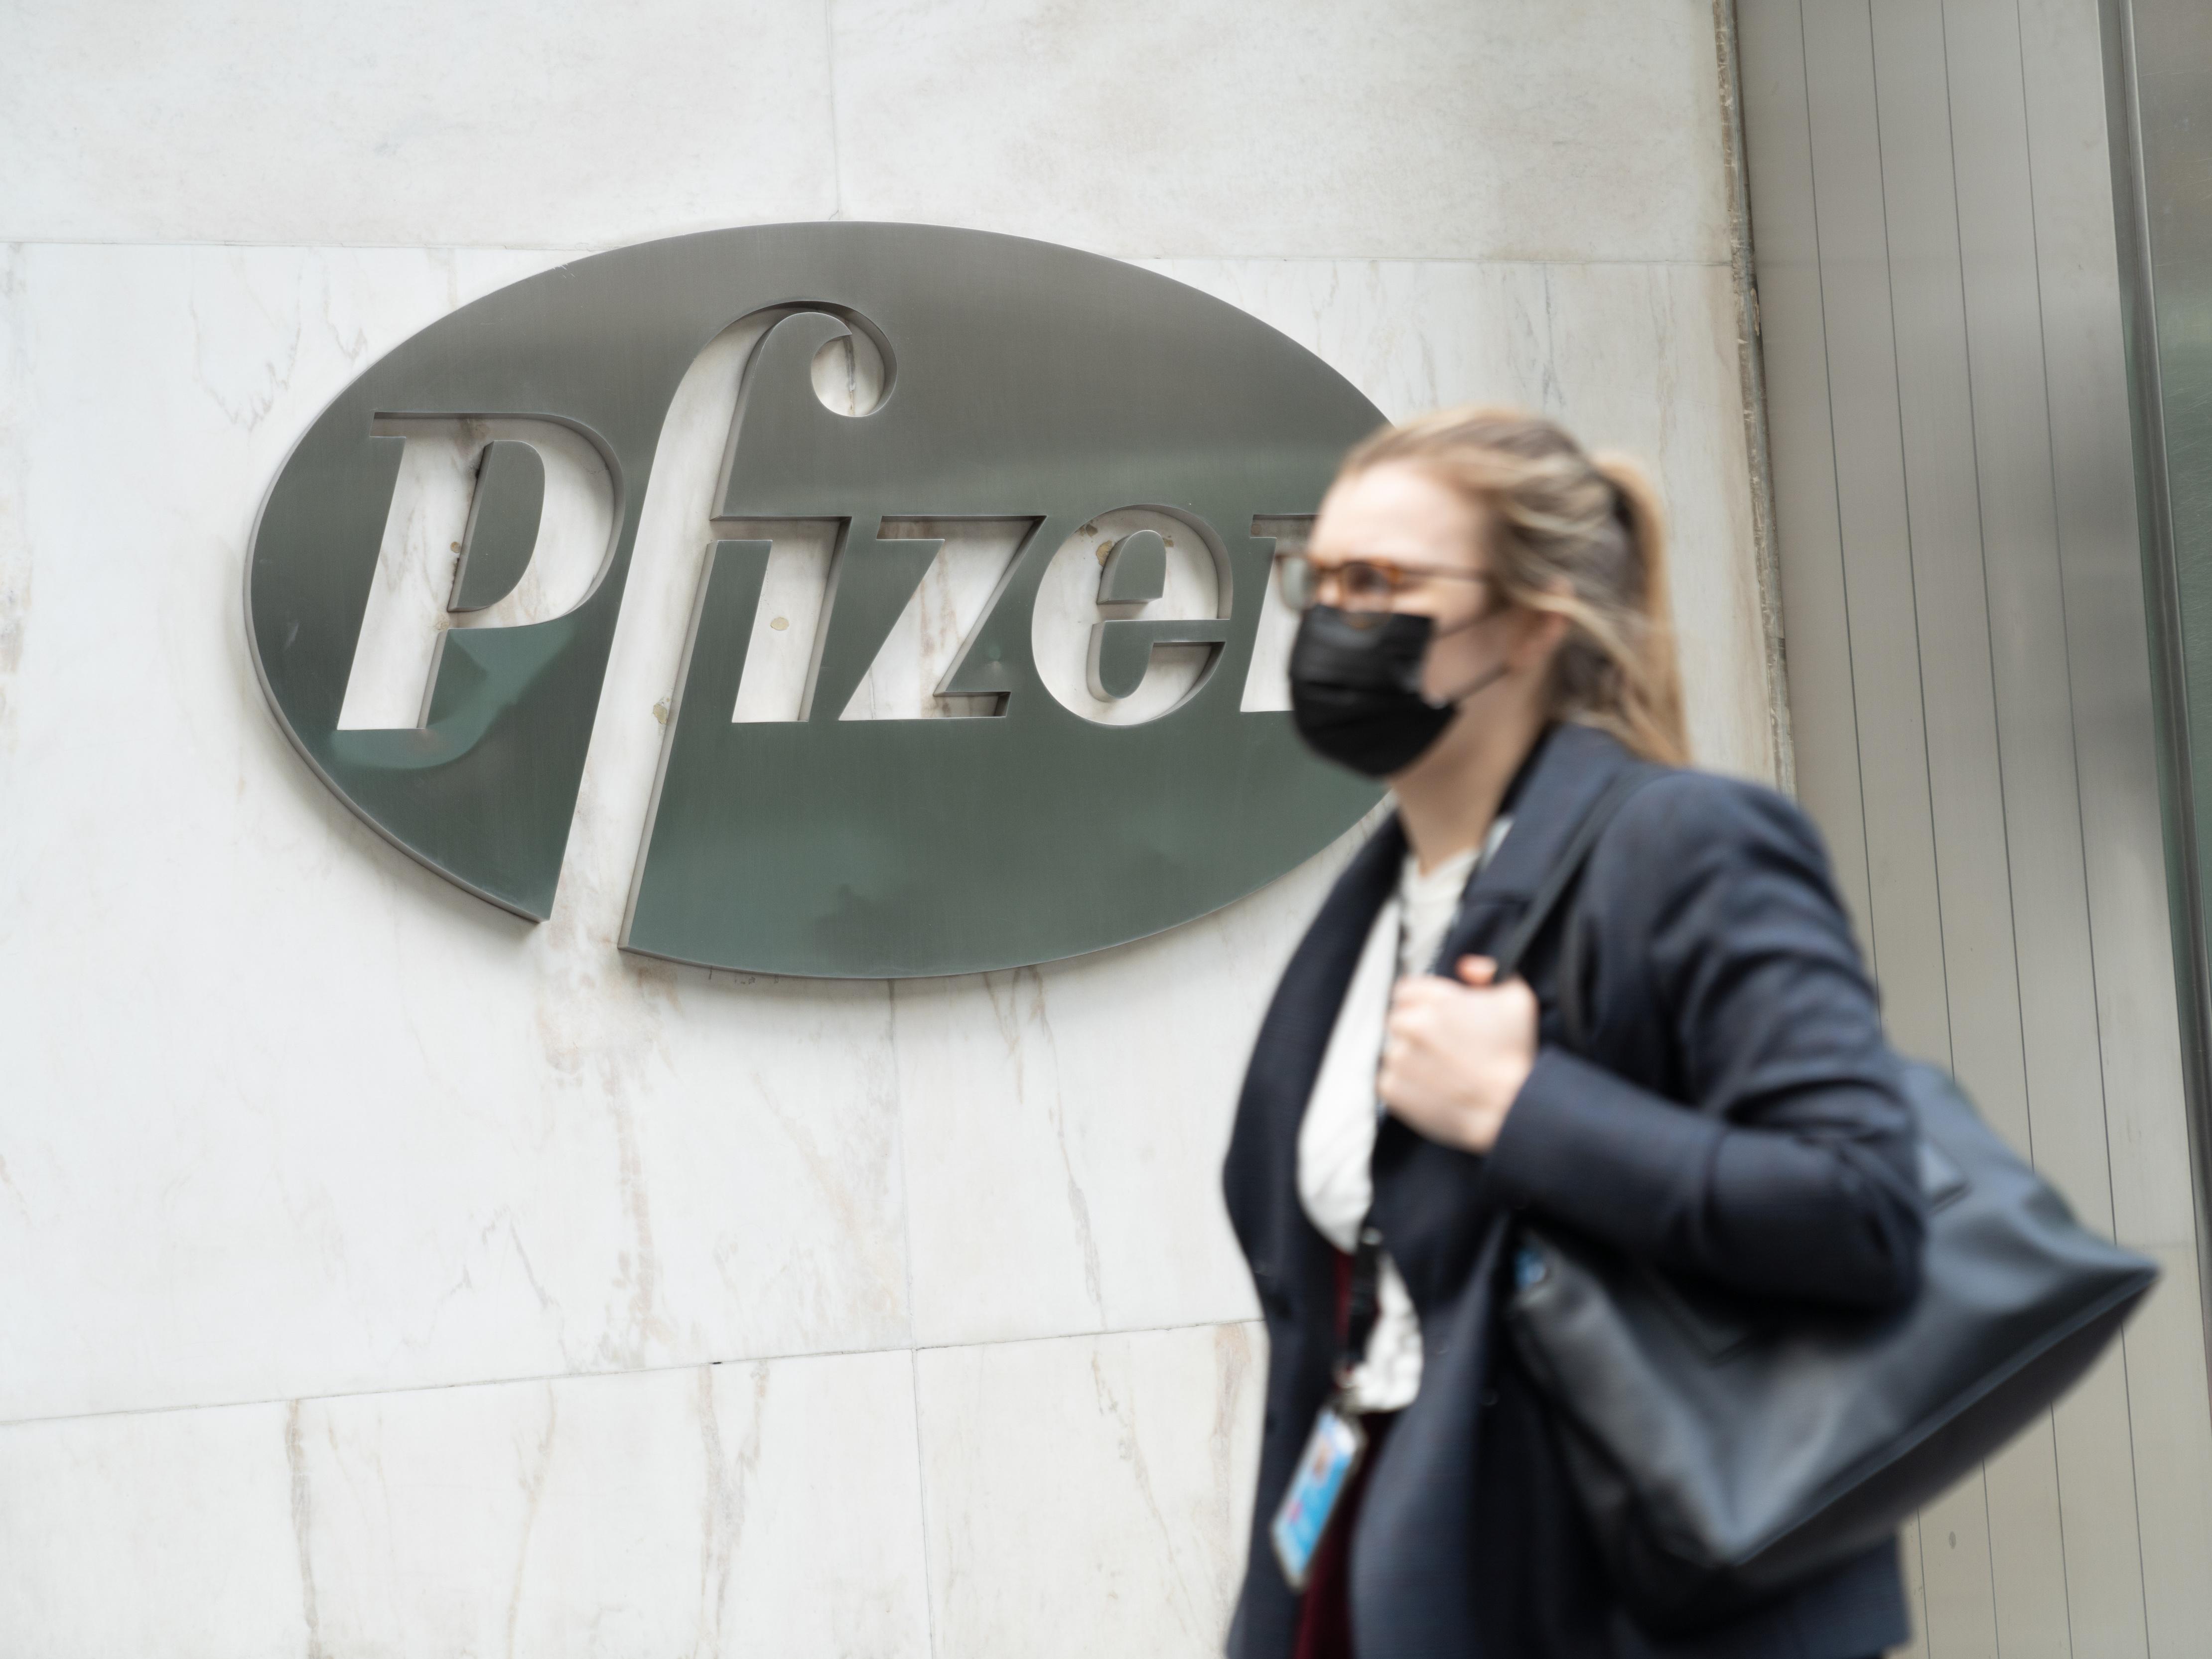 Fda Analysis Supports Emergency Use Of Pfizer Covid 19 Vaccine Shots Health News Npr